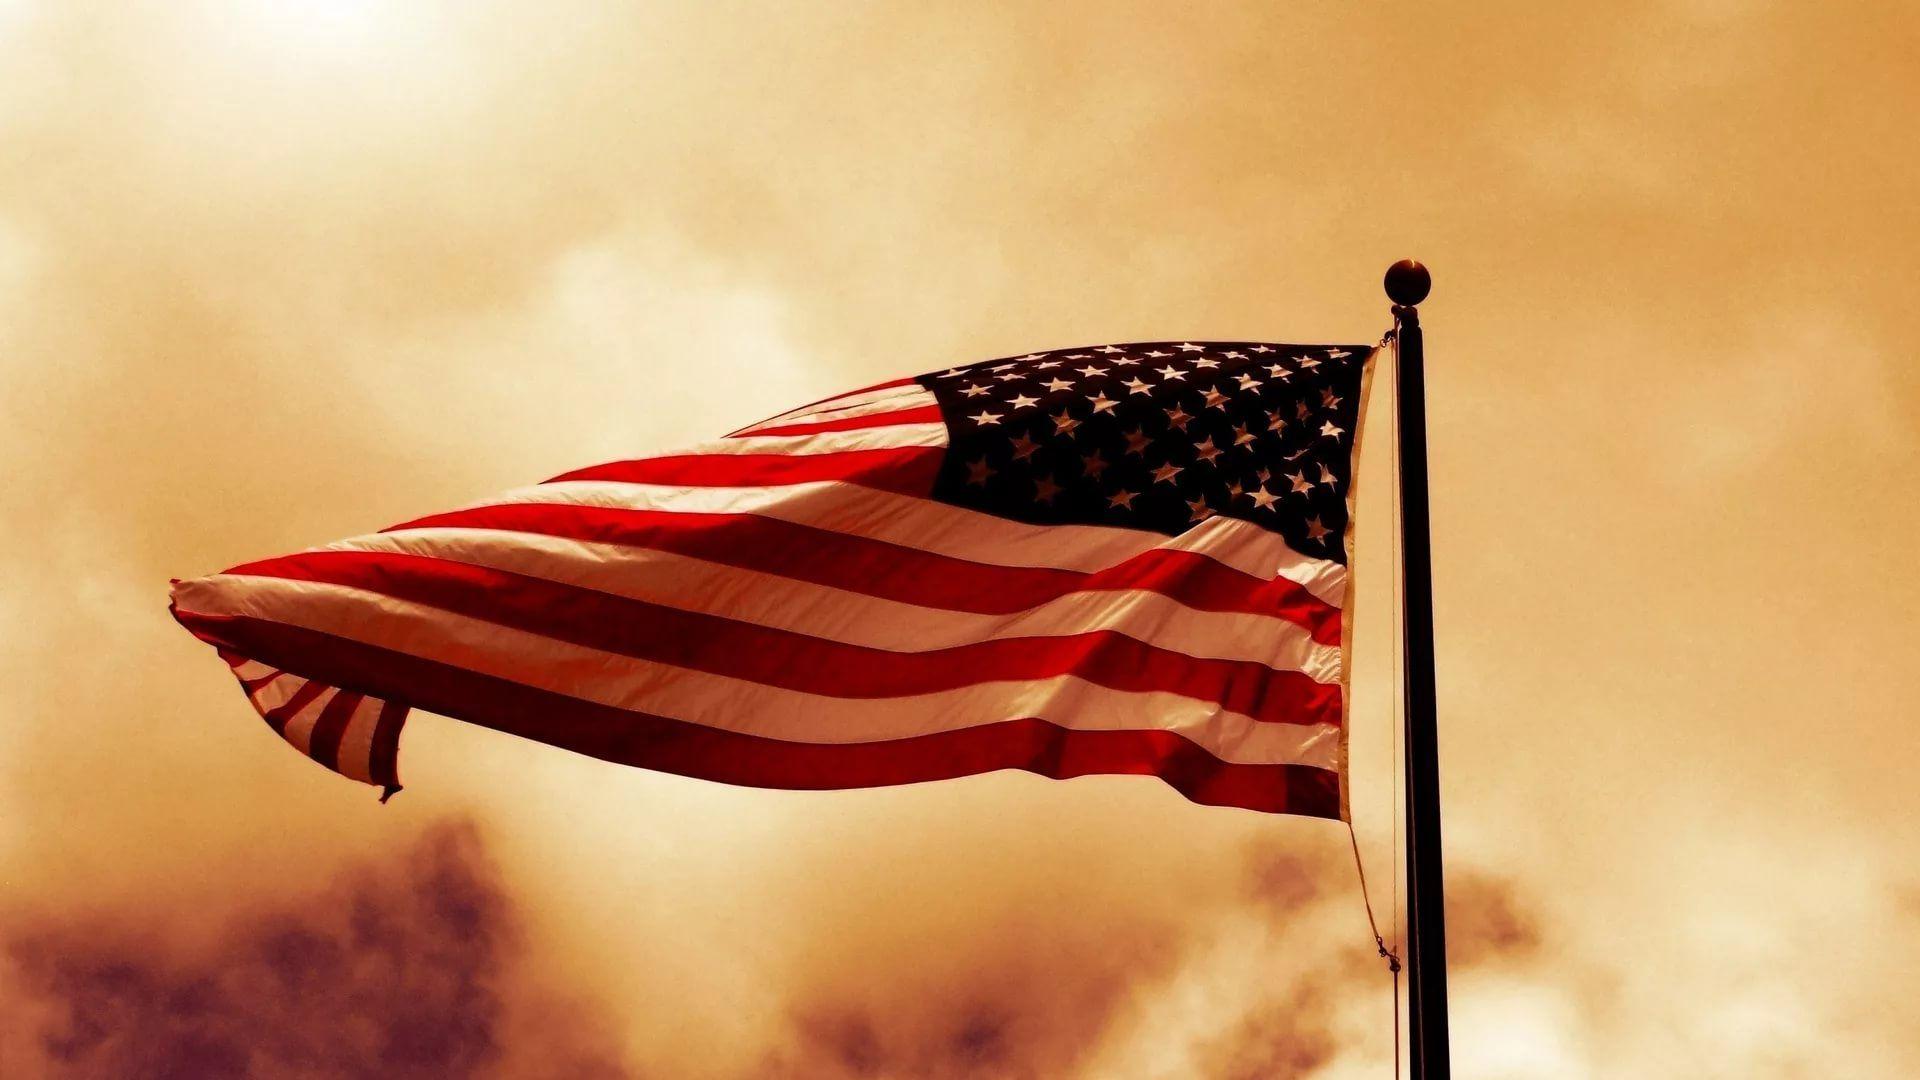 America Flag Image